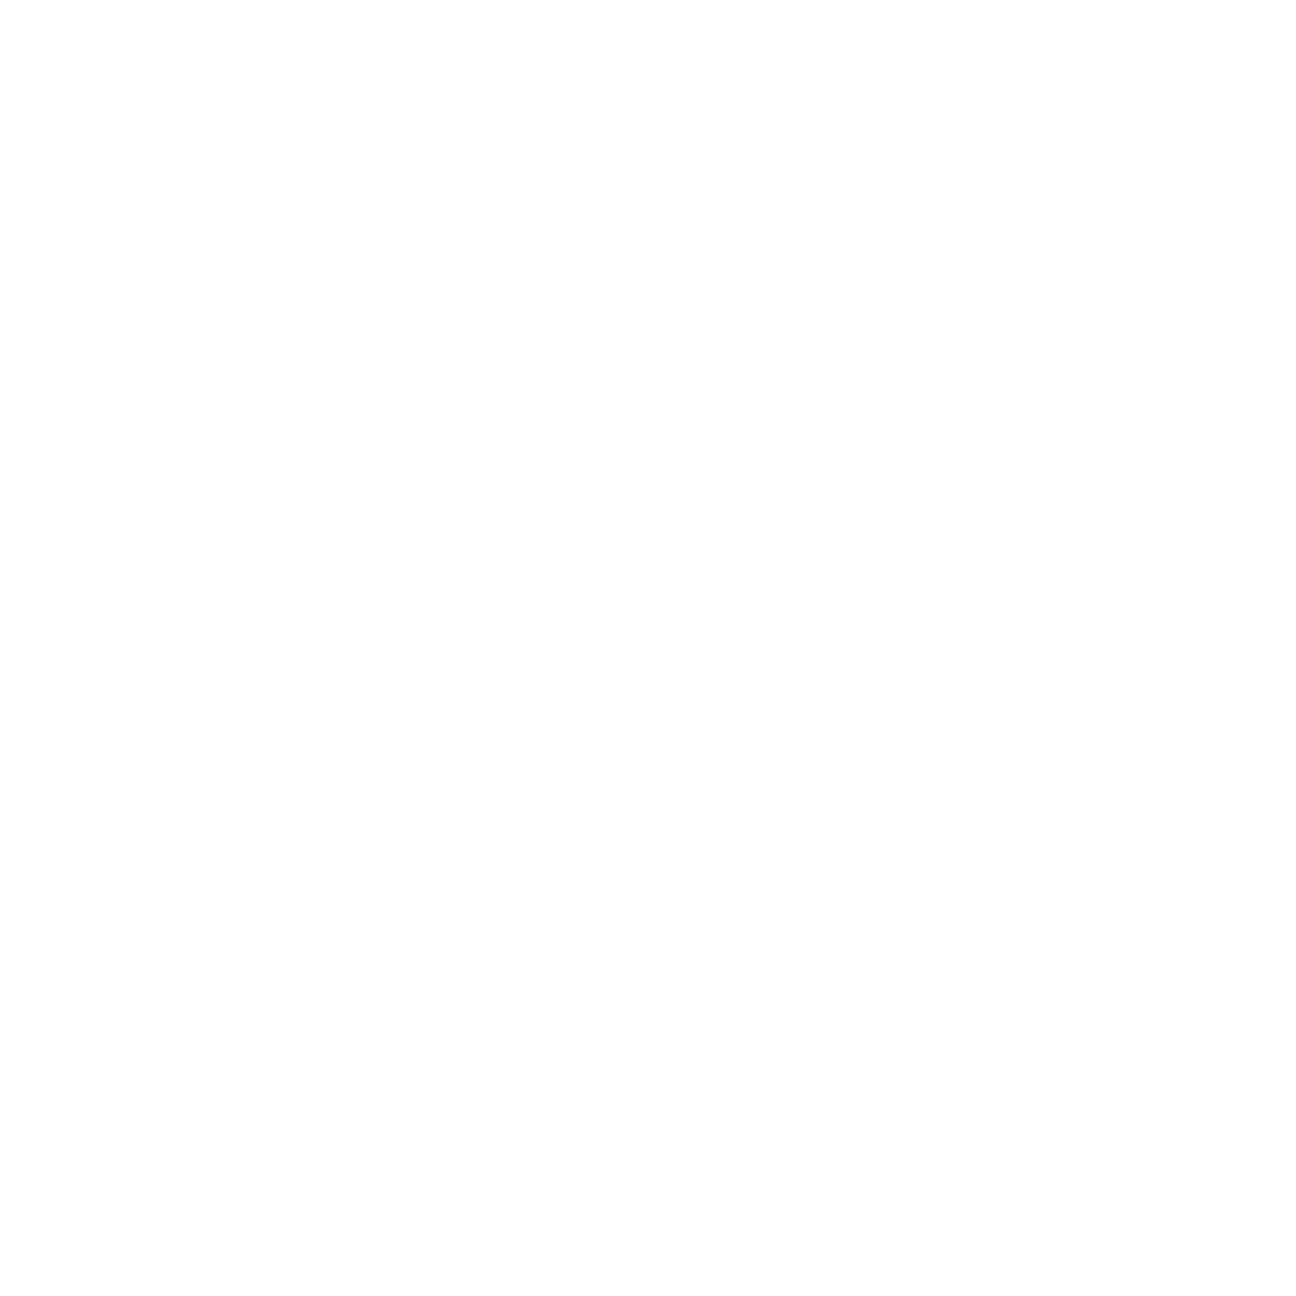 IBM_Watson_White